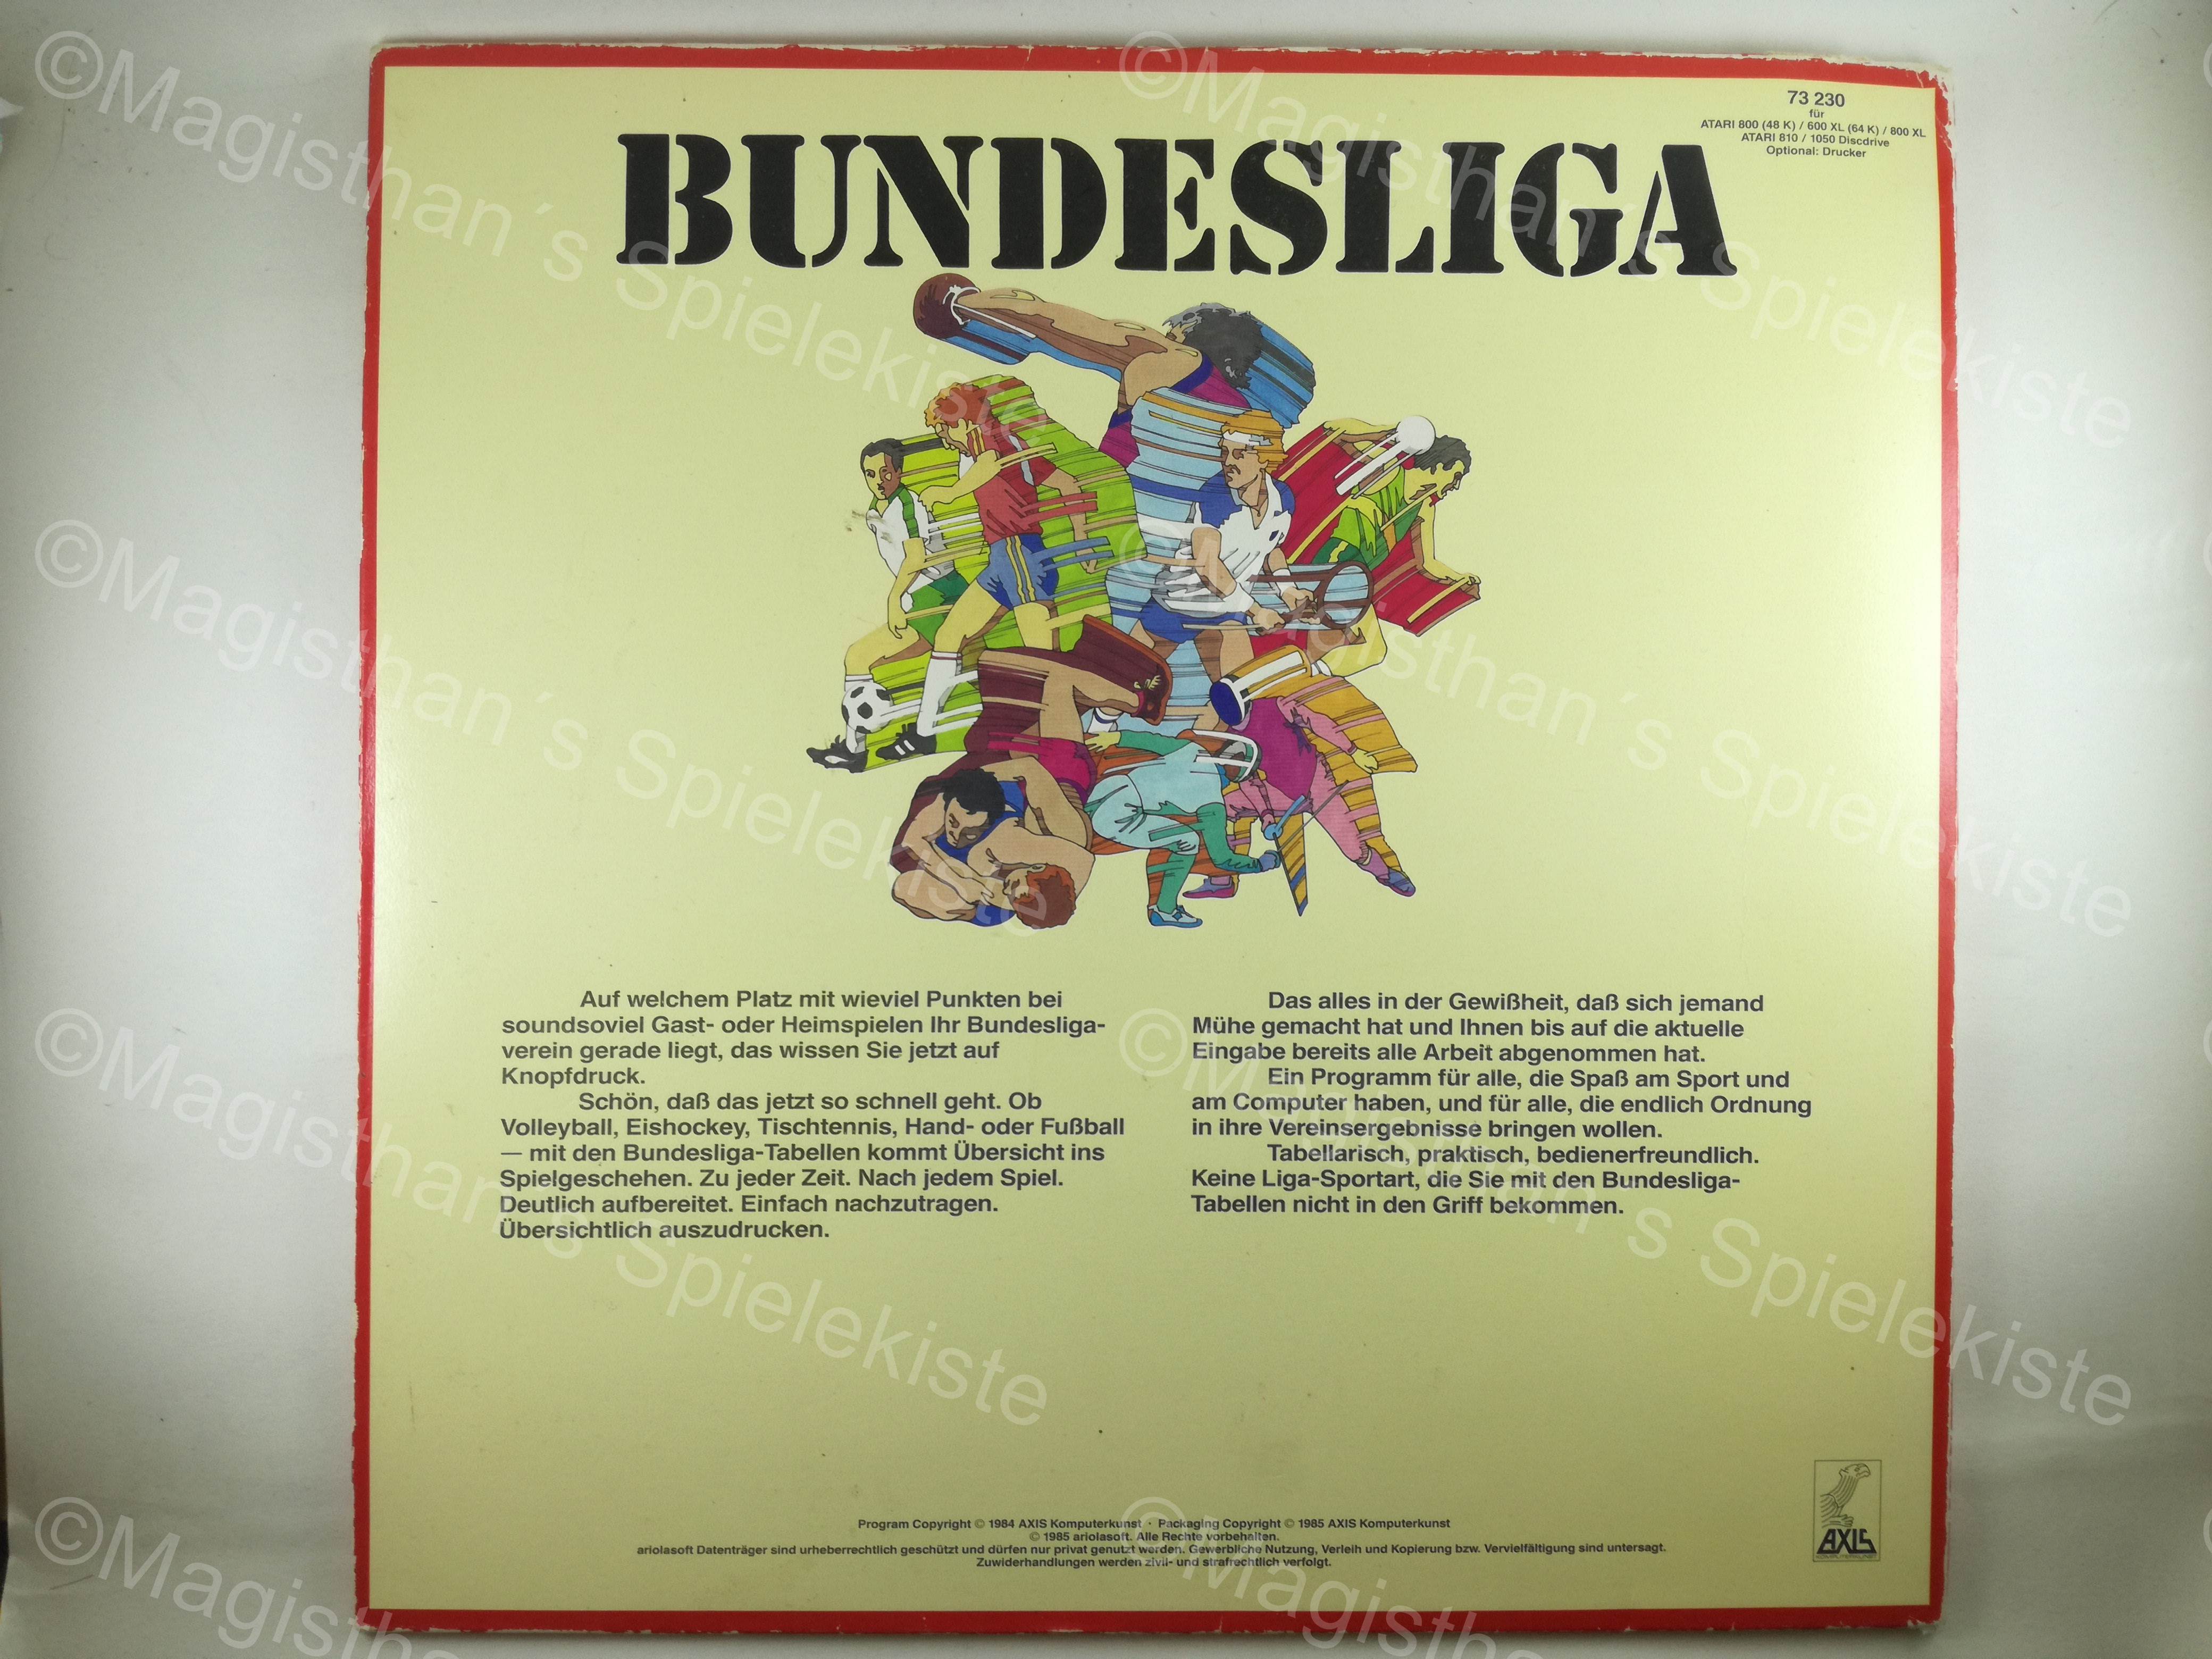 BundesligaAtari1_back.jpg